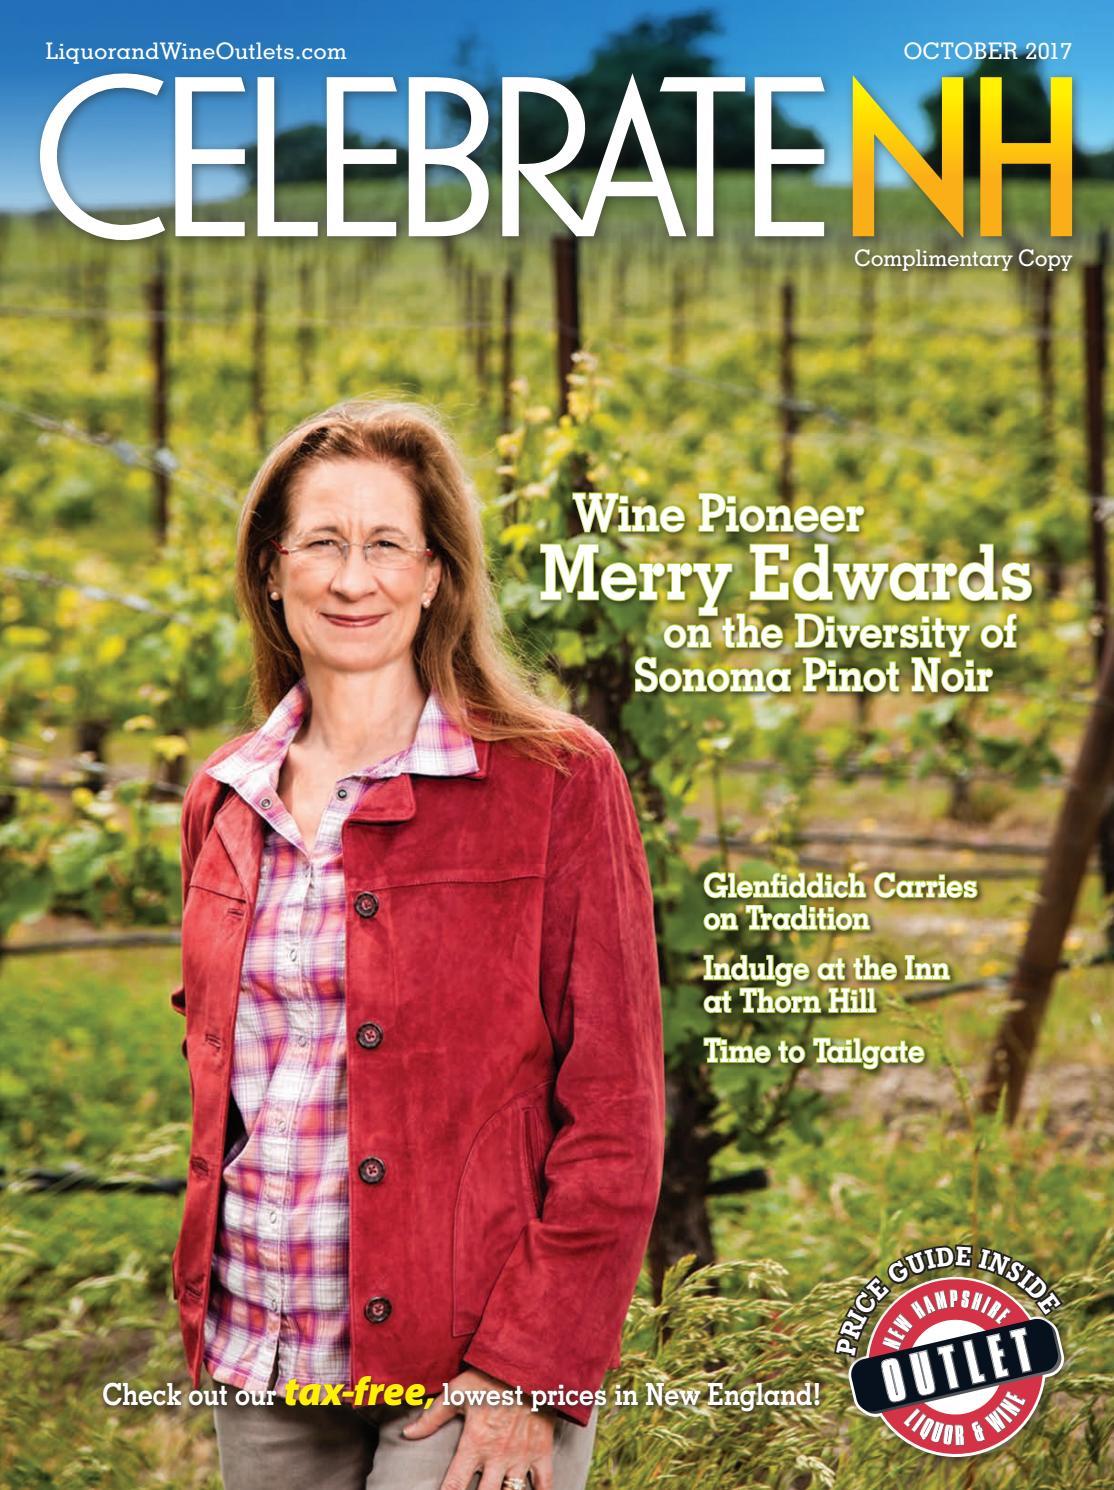 9e7ece11e04a Celebrate NH October 2017 by McLean Communications - issuu